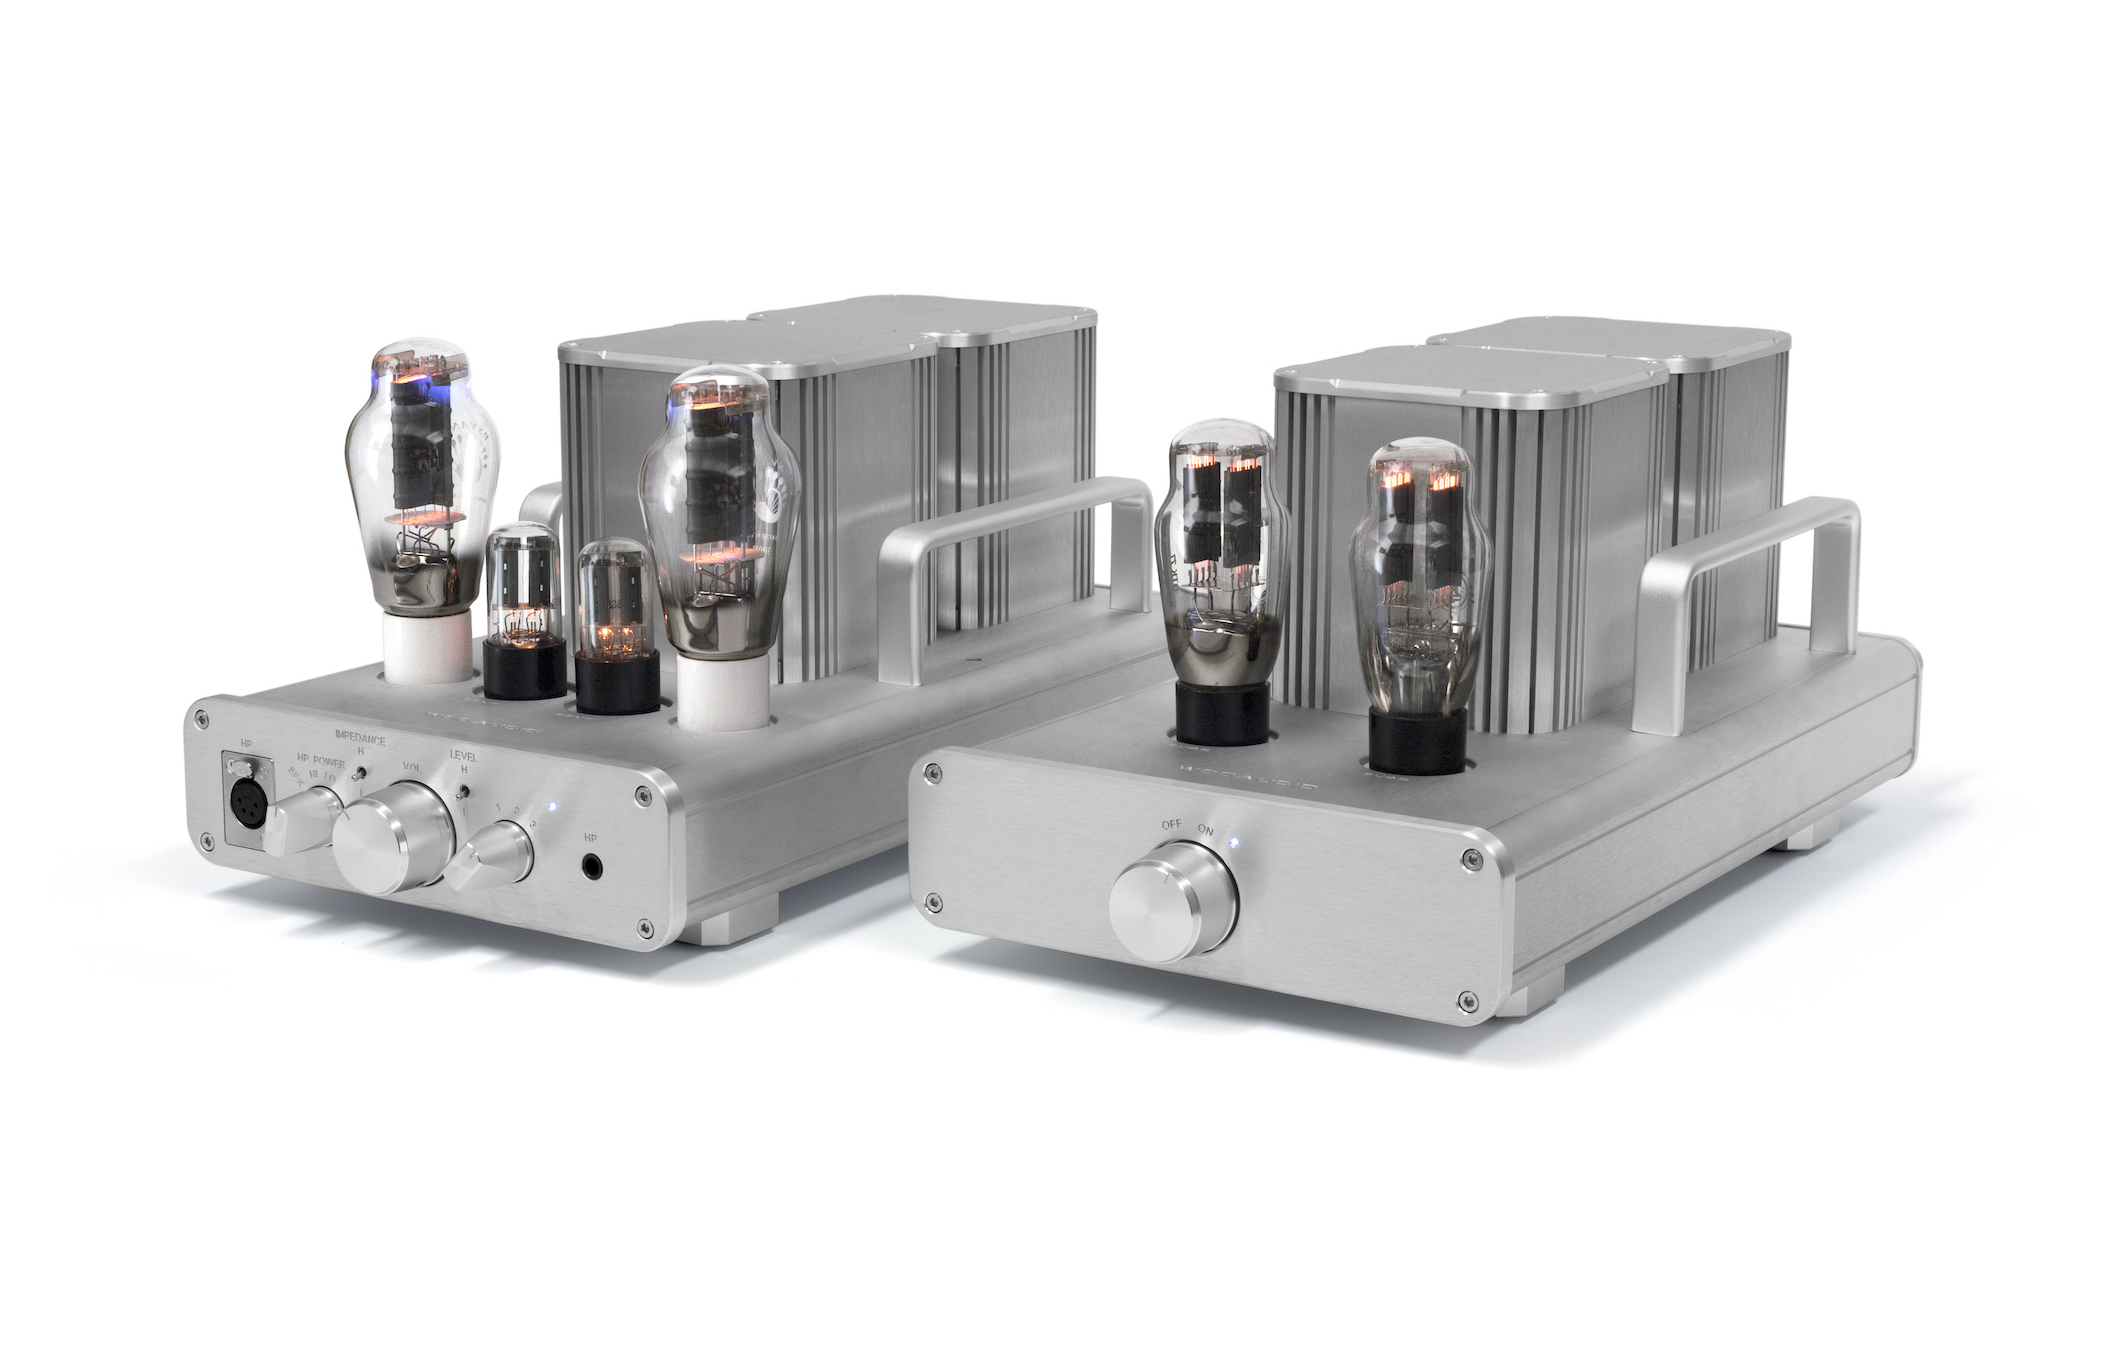 woo-audio-wa5-silver-headphone-amplifier-front-highend-audiophile-vacuum-tube-headfi-300b-6sn7-274b-5u4g-tubes-preamplifier-powerful-amp